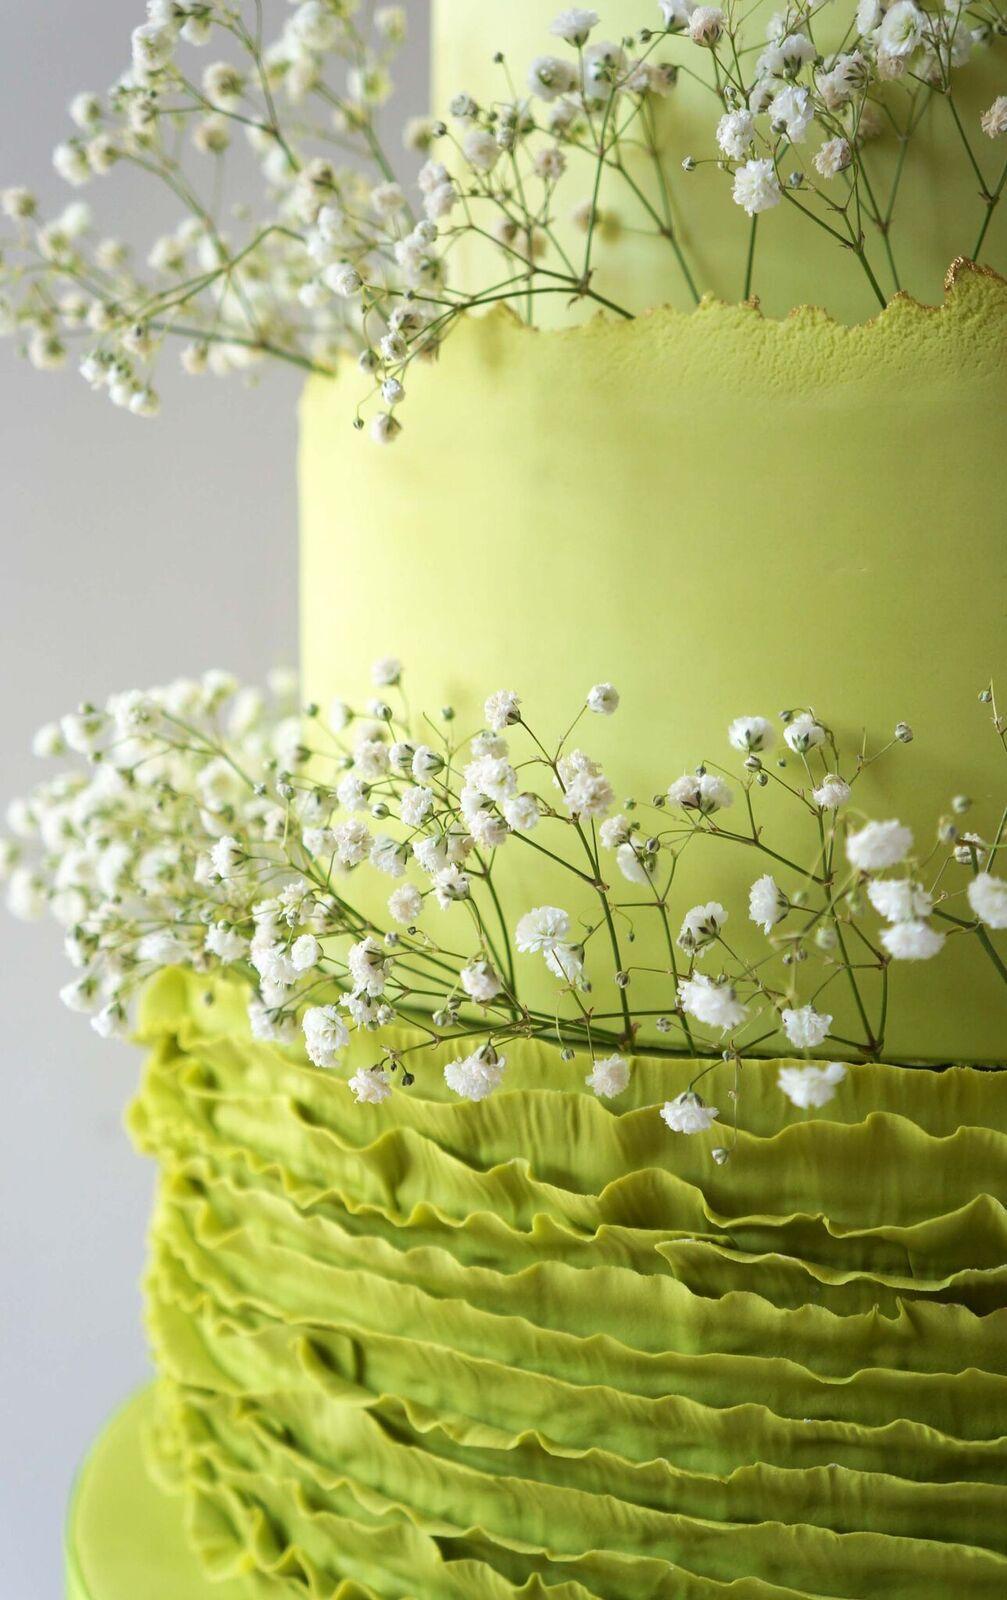 Enrique-Roja-HAVE-SOME-CAKE-Wedding-Elegant-12.jpeg#asset:15186